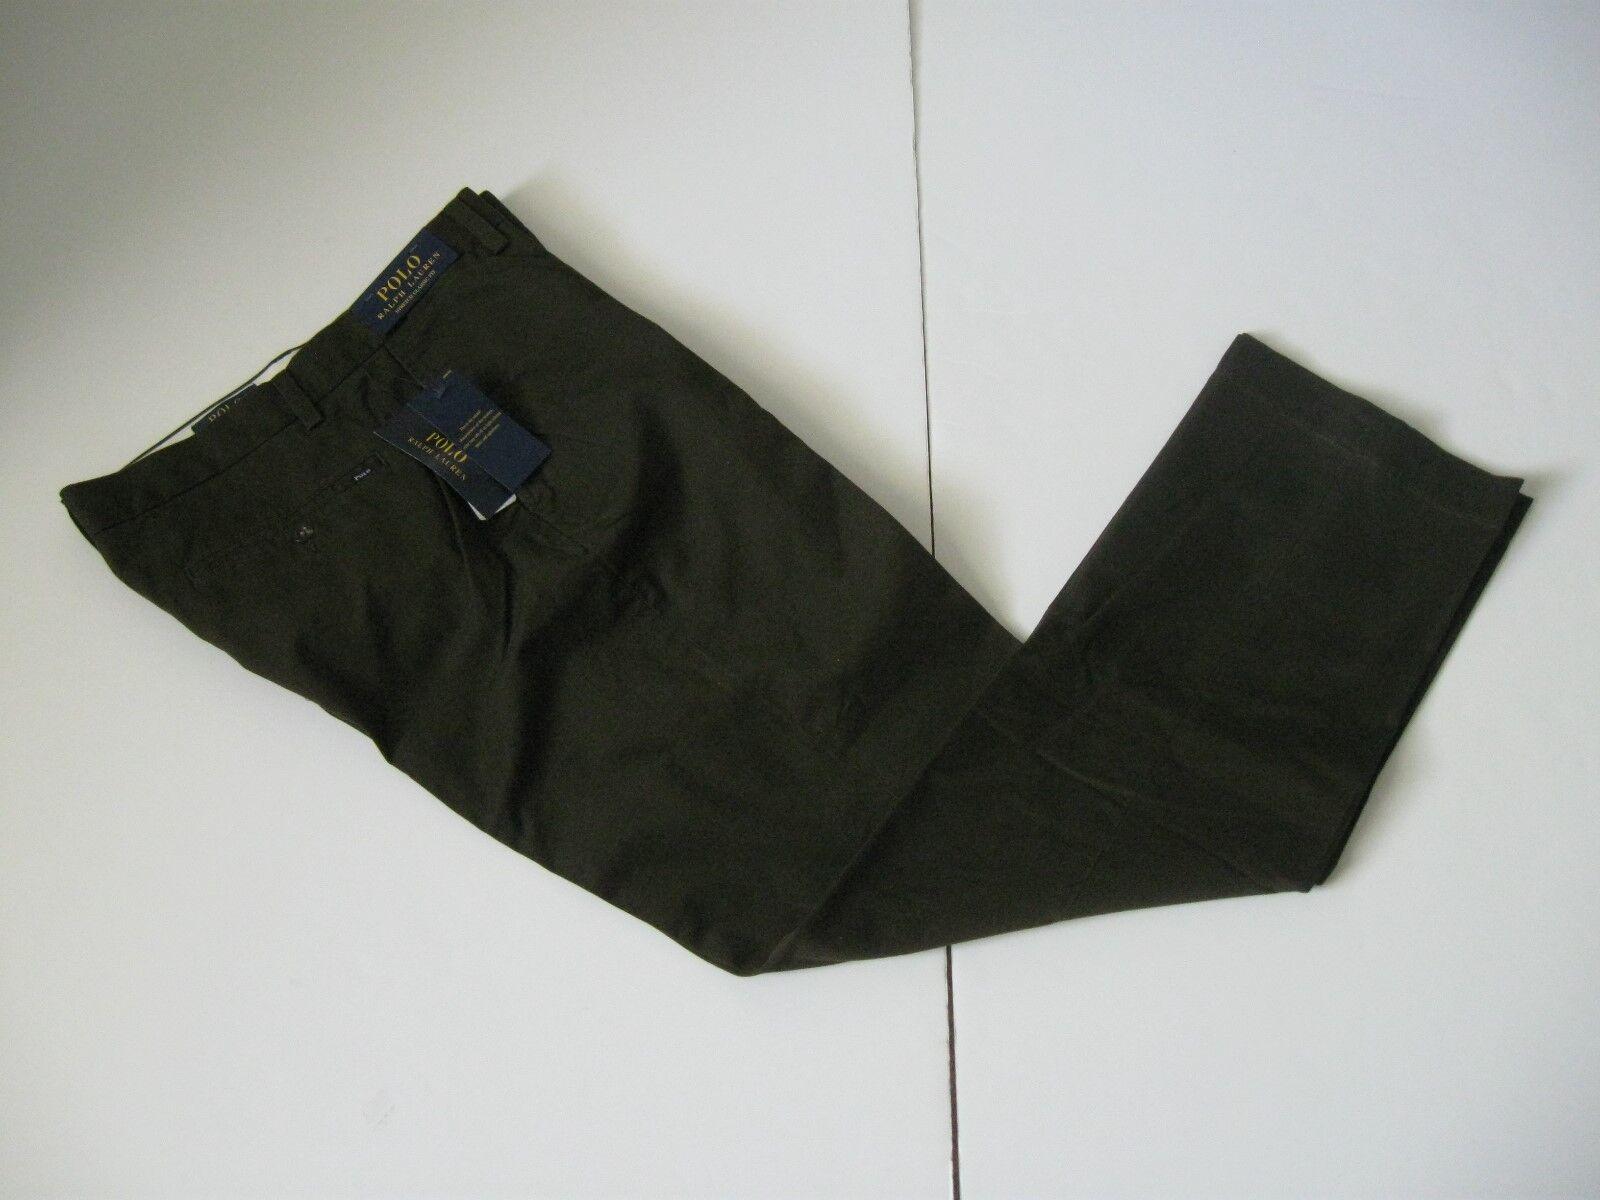 POLO RALPH LAUREN Men's Olive Classic-Fit Cotton Blend Stretch Twill Pants 34x30